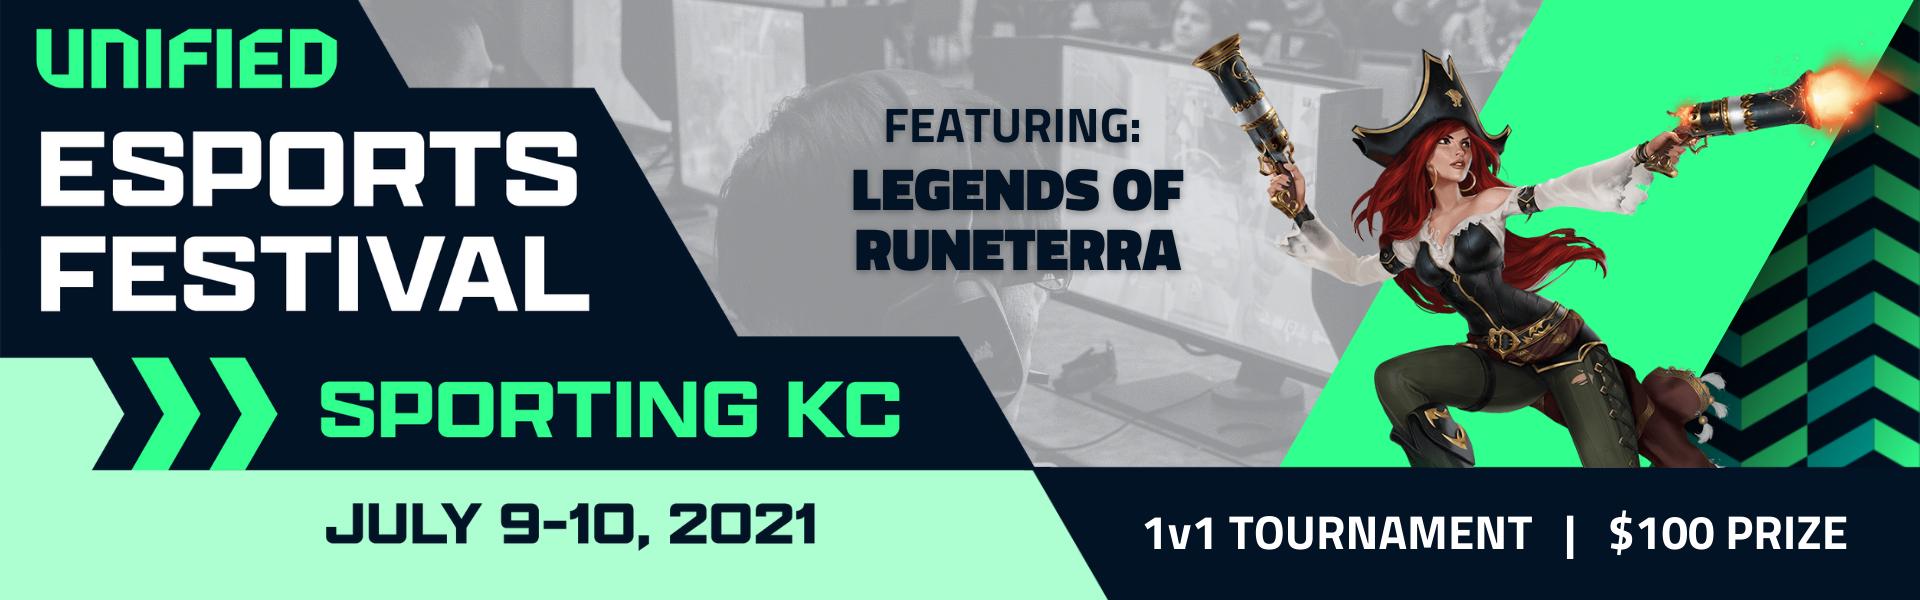 EF:SKC Featuring Legends of Runeterra (Mobile)